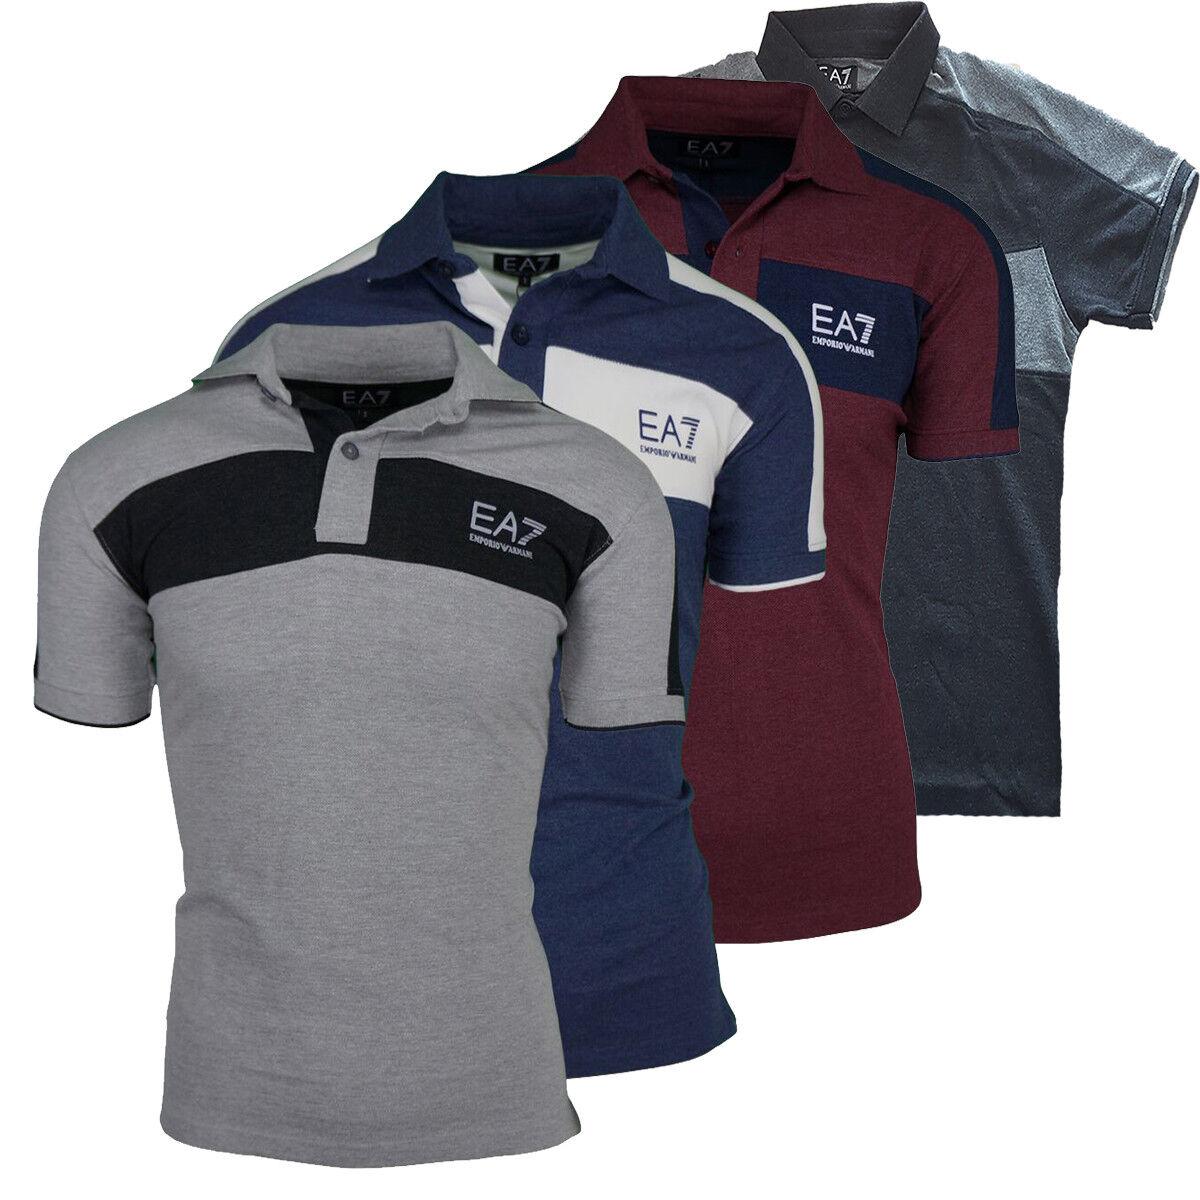 EA7 Emporio Armani Polo Shirt short Sleeve Cotton S M L XL XXL